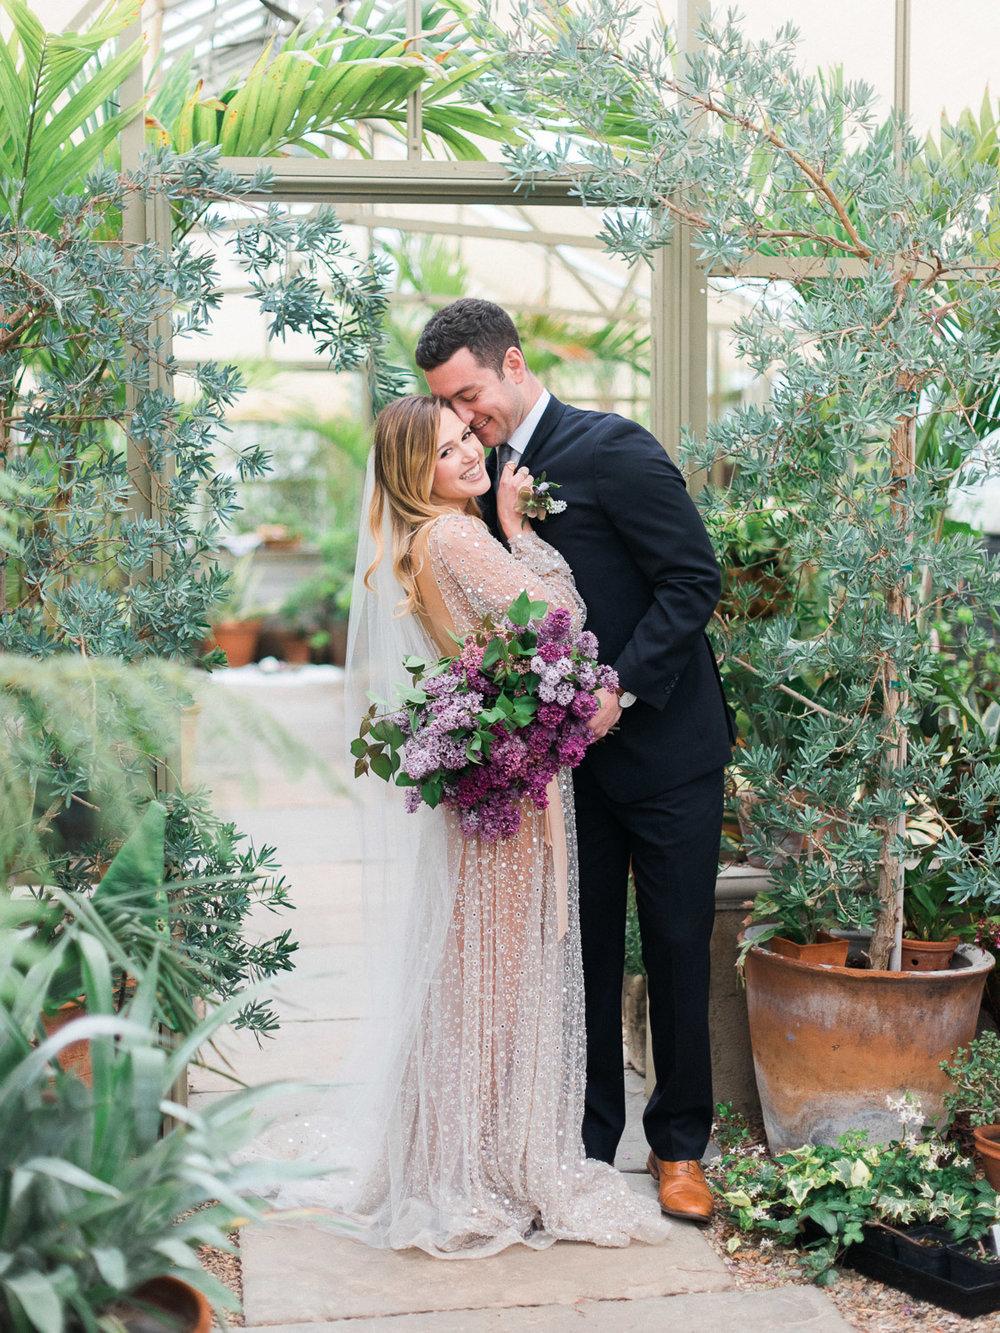 christinadavisphotography+romantic+greenhouse+jardindebuis+styledshoot49.jpg